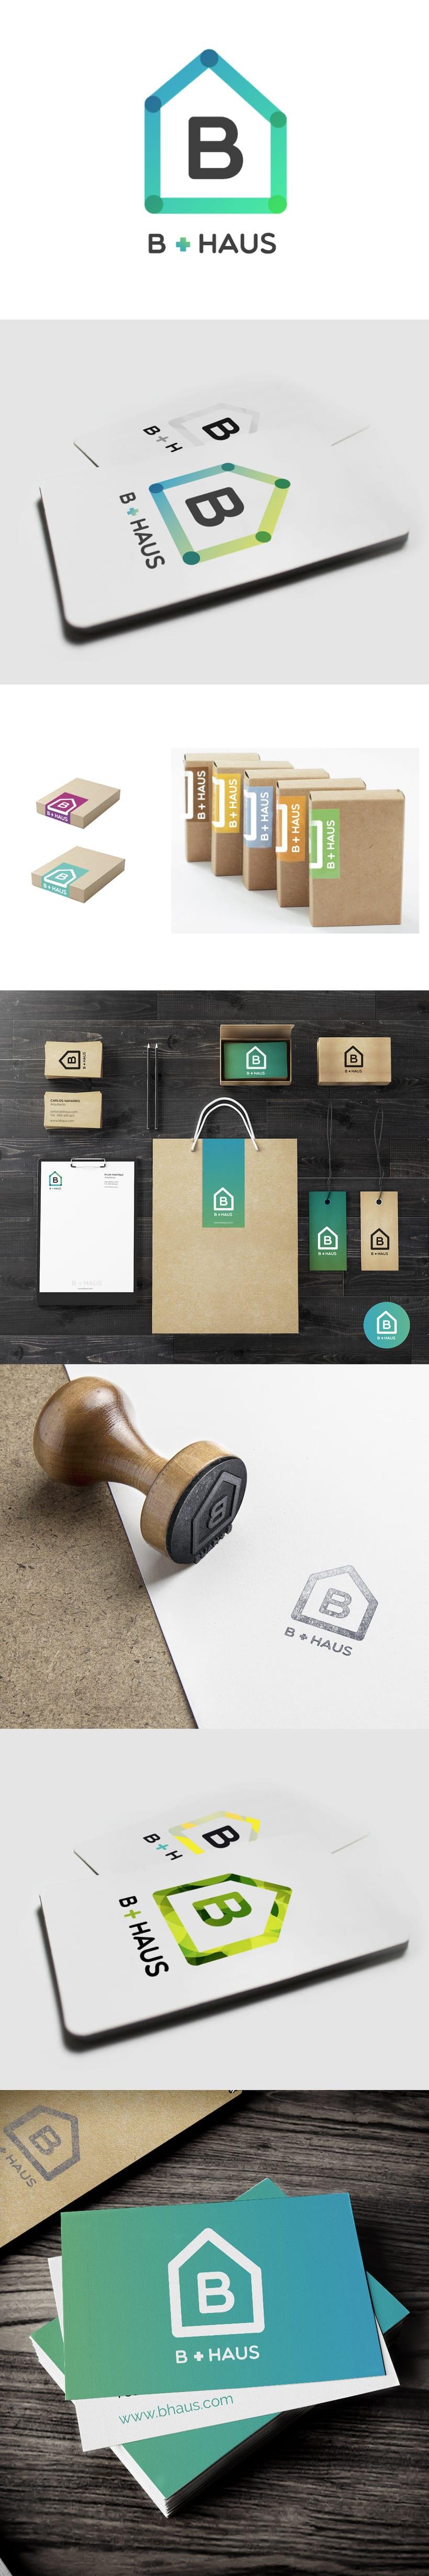 Identidad flexible para B+Haus 2